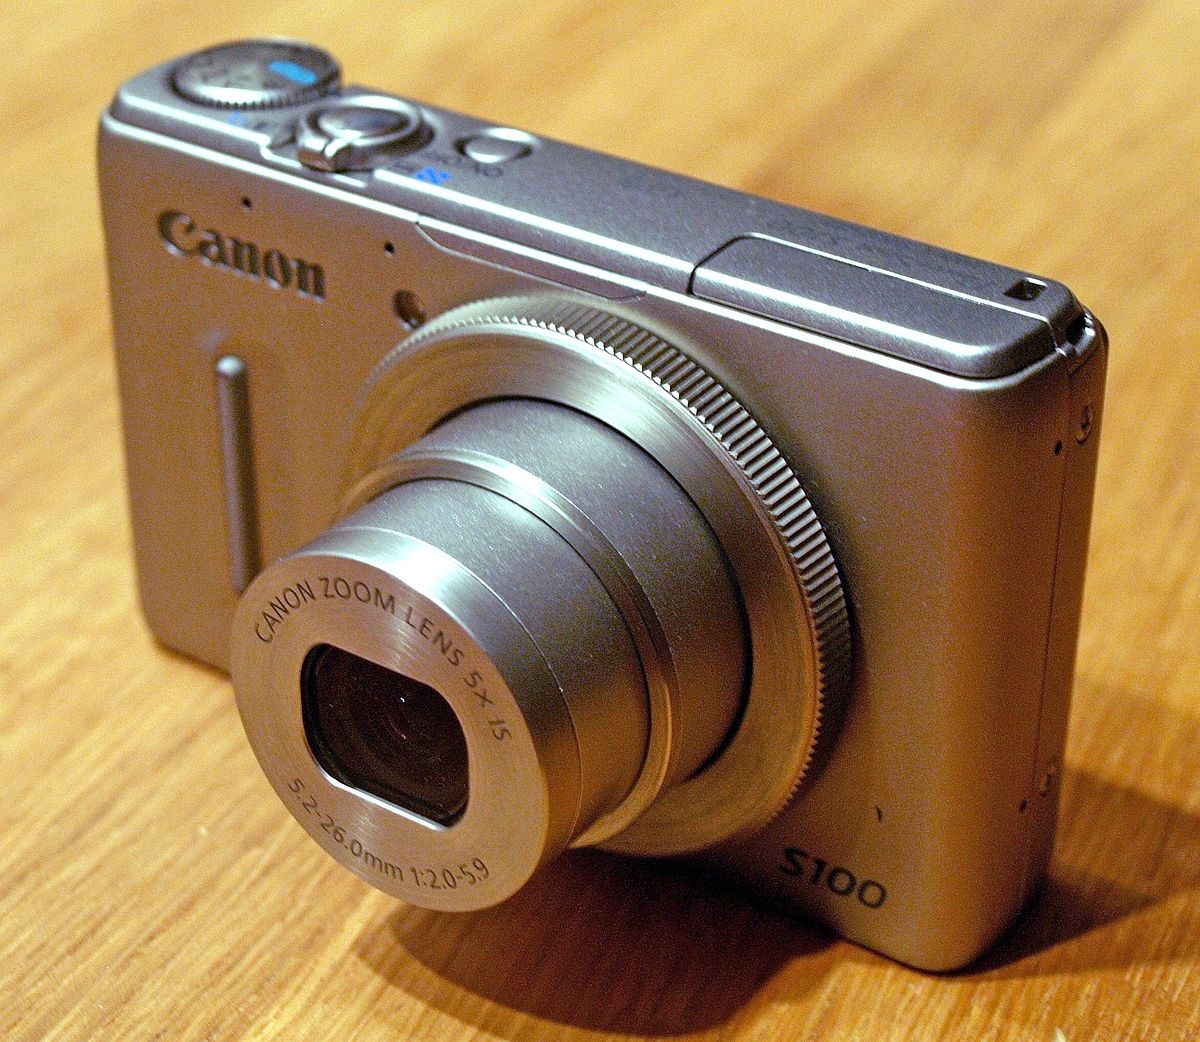 canon digital ixus 120 is manual